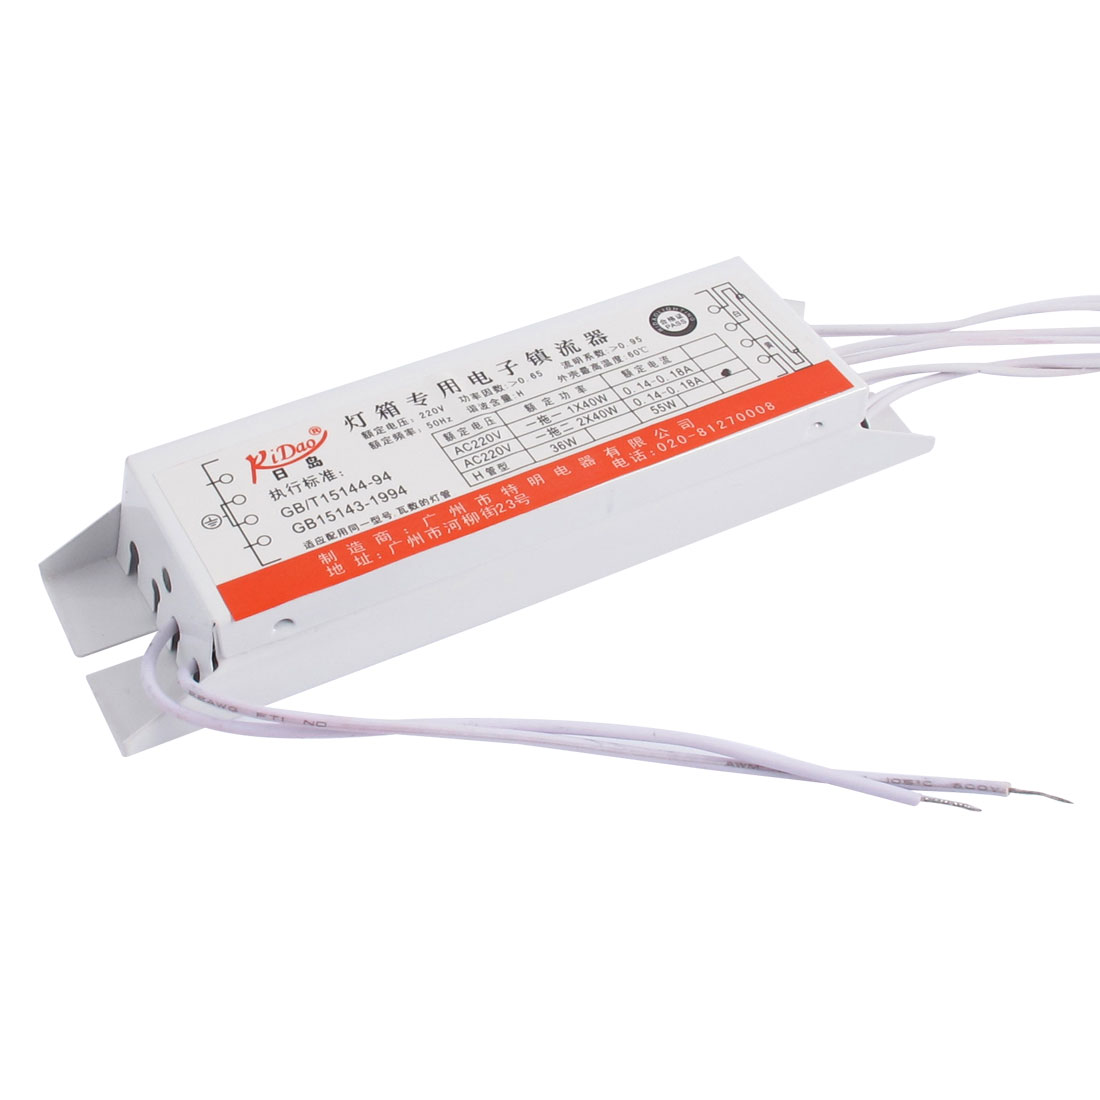 AC 220V Refrigerator Electronic Fluorescent Lamp Ballast for H Tube